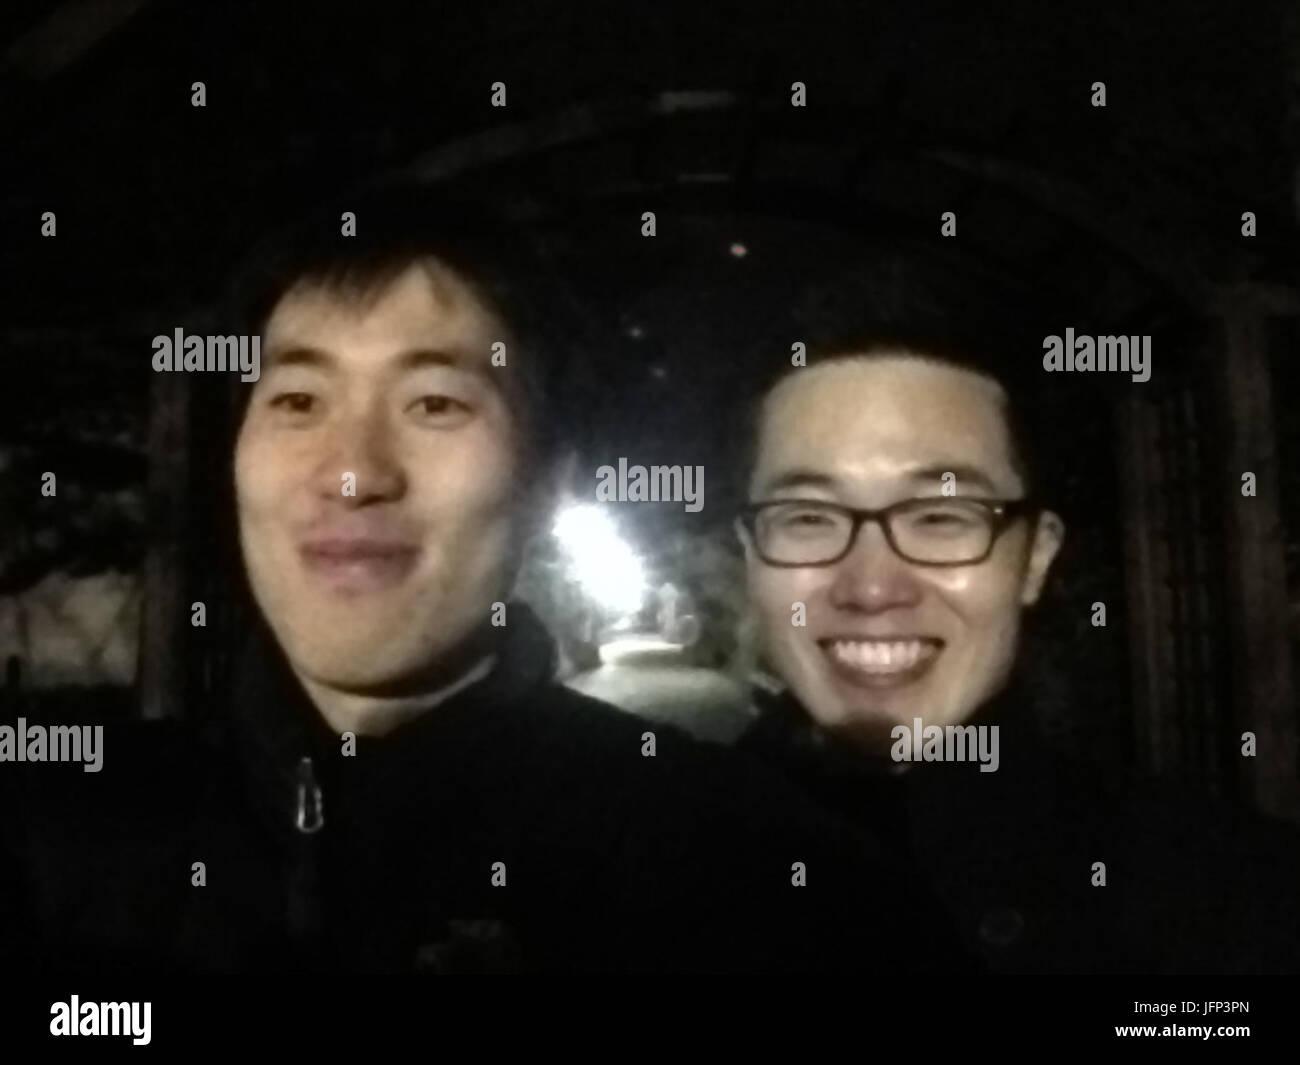 2012-04-08 .46.10 BCE59BCAPI491EBAAA8 Choe Kwangmo s iPhone Photo Stock